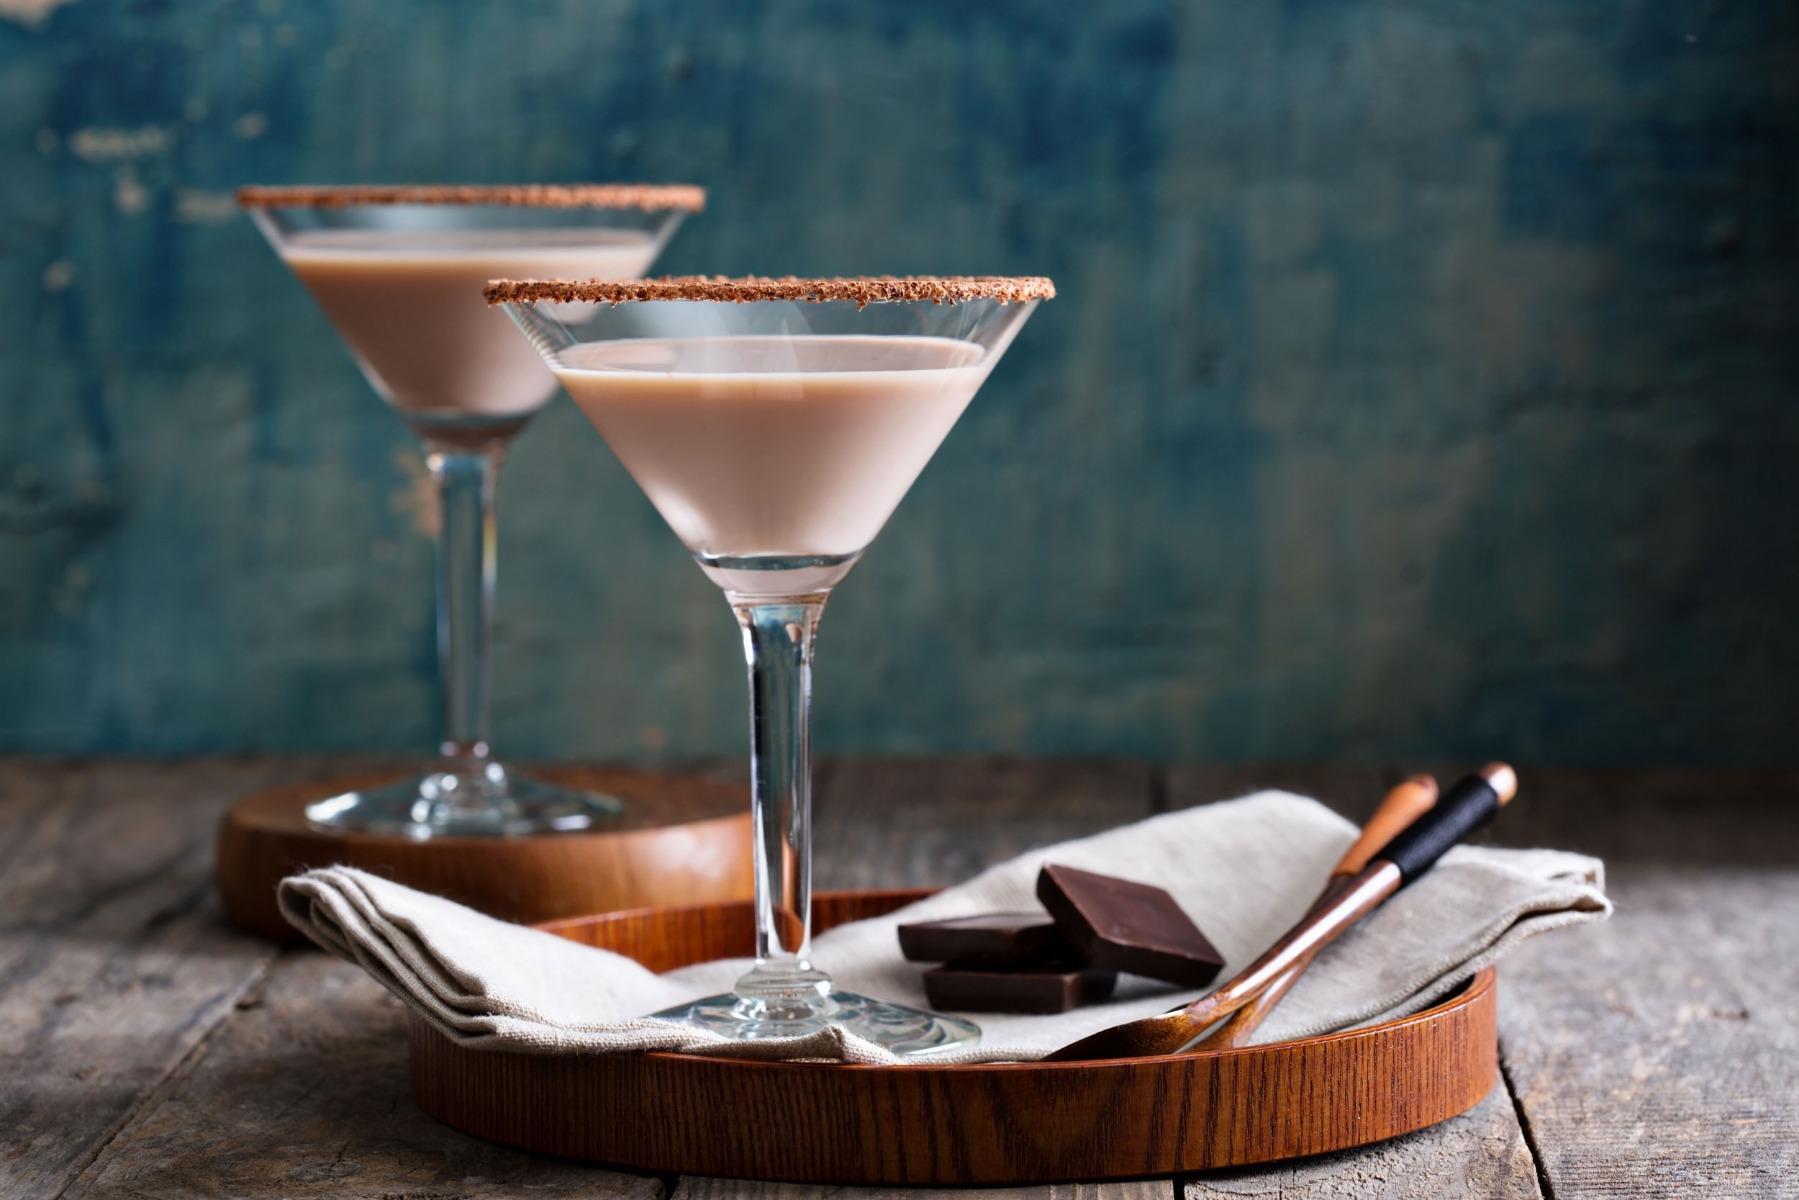 PrikenTik - Bartender - Chocolate Martini